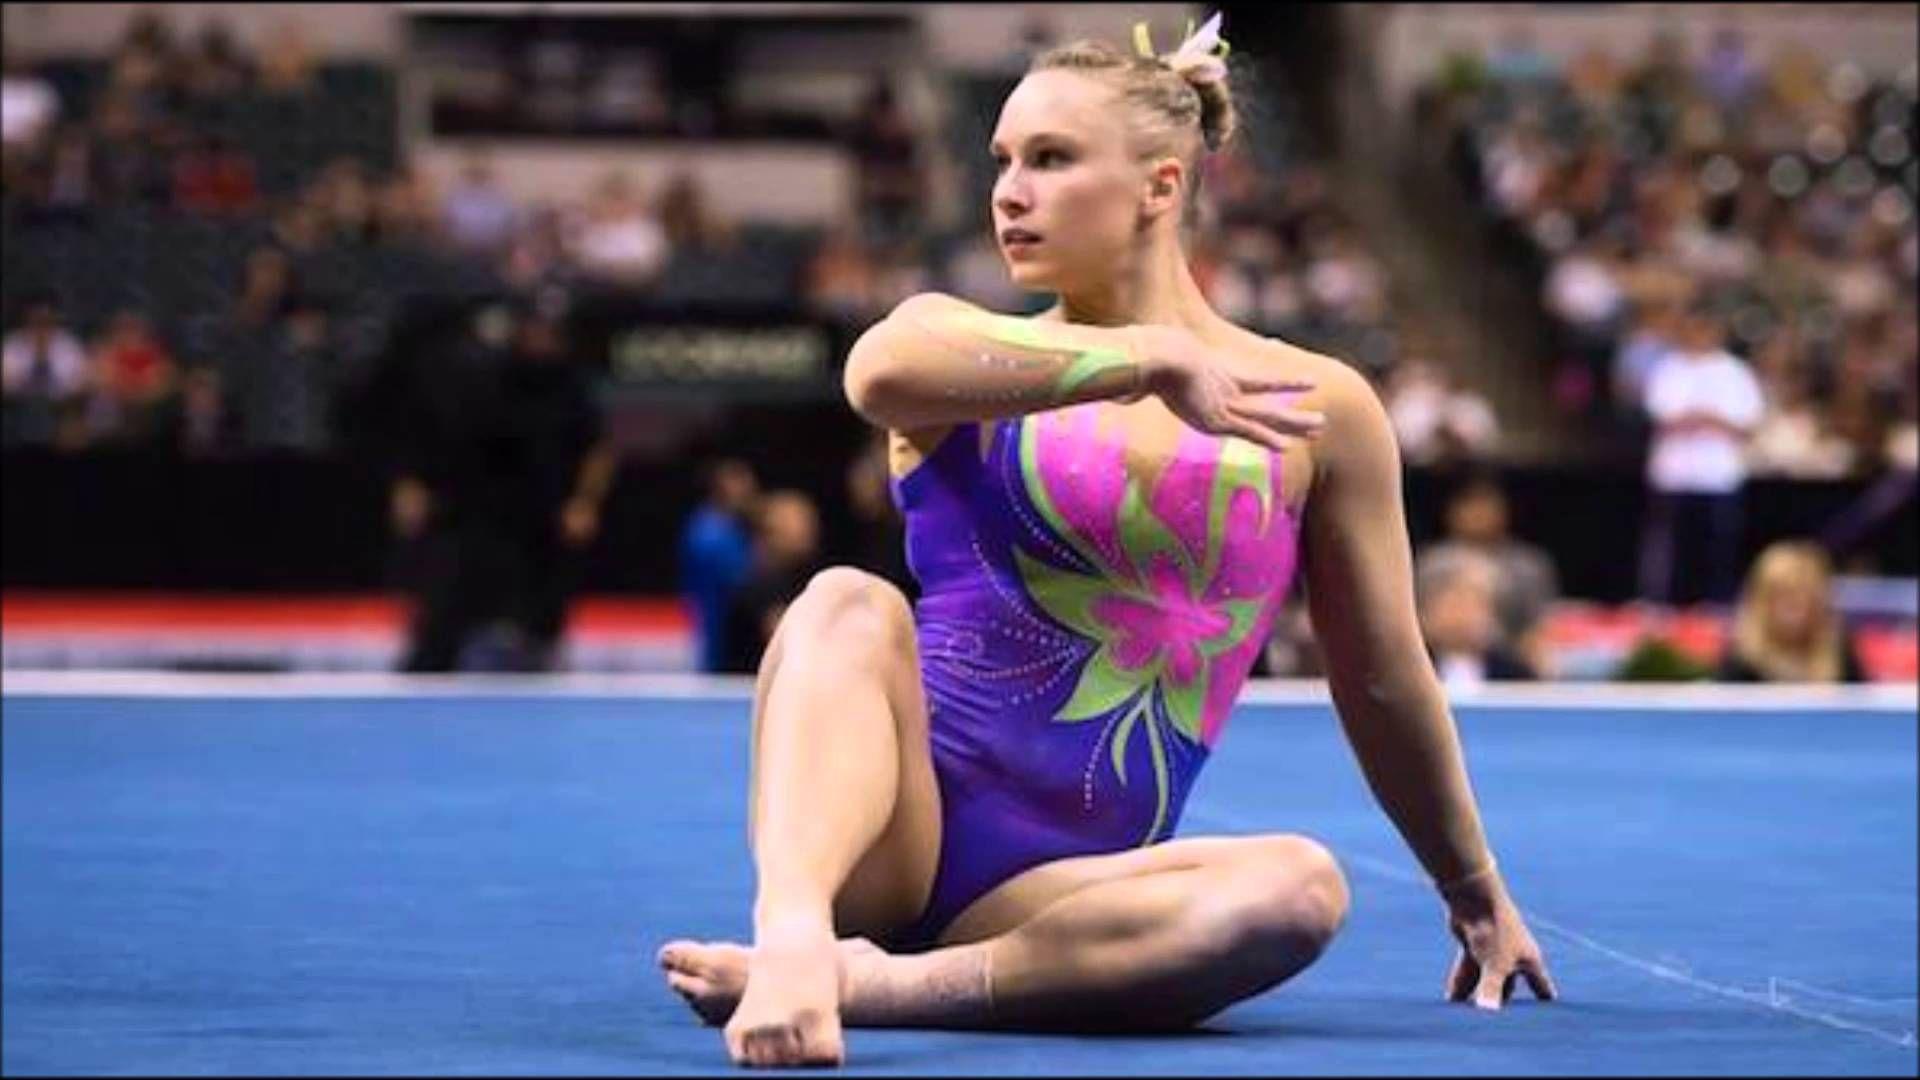 Don T Let Me Down Gymnastics Floor Music Gymnastics Floor Music Gymnastics Floor Gymnastics Floor Routine Music